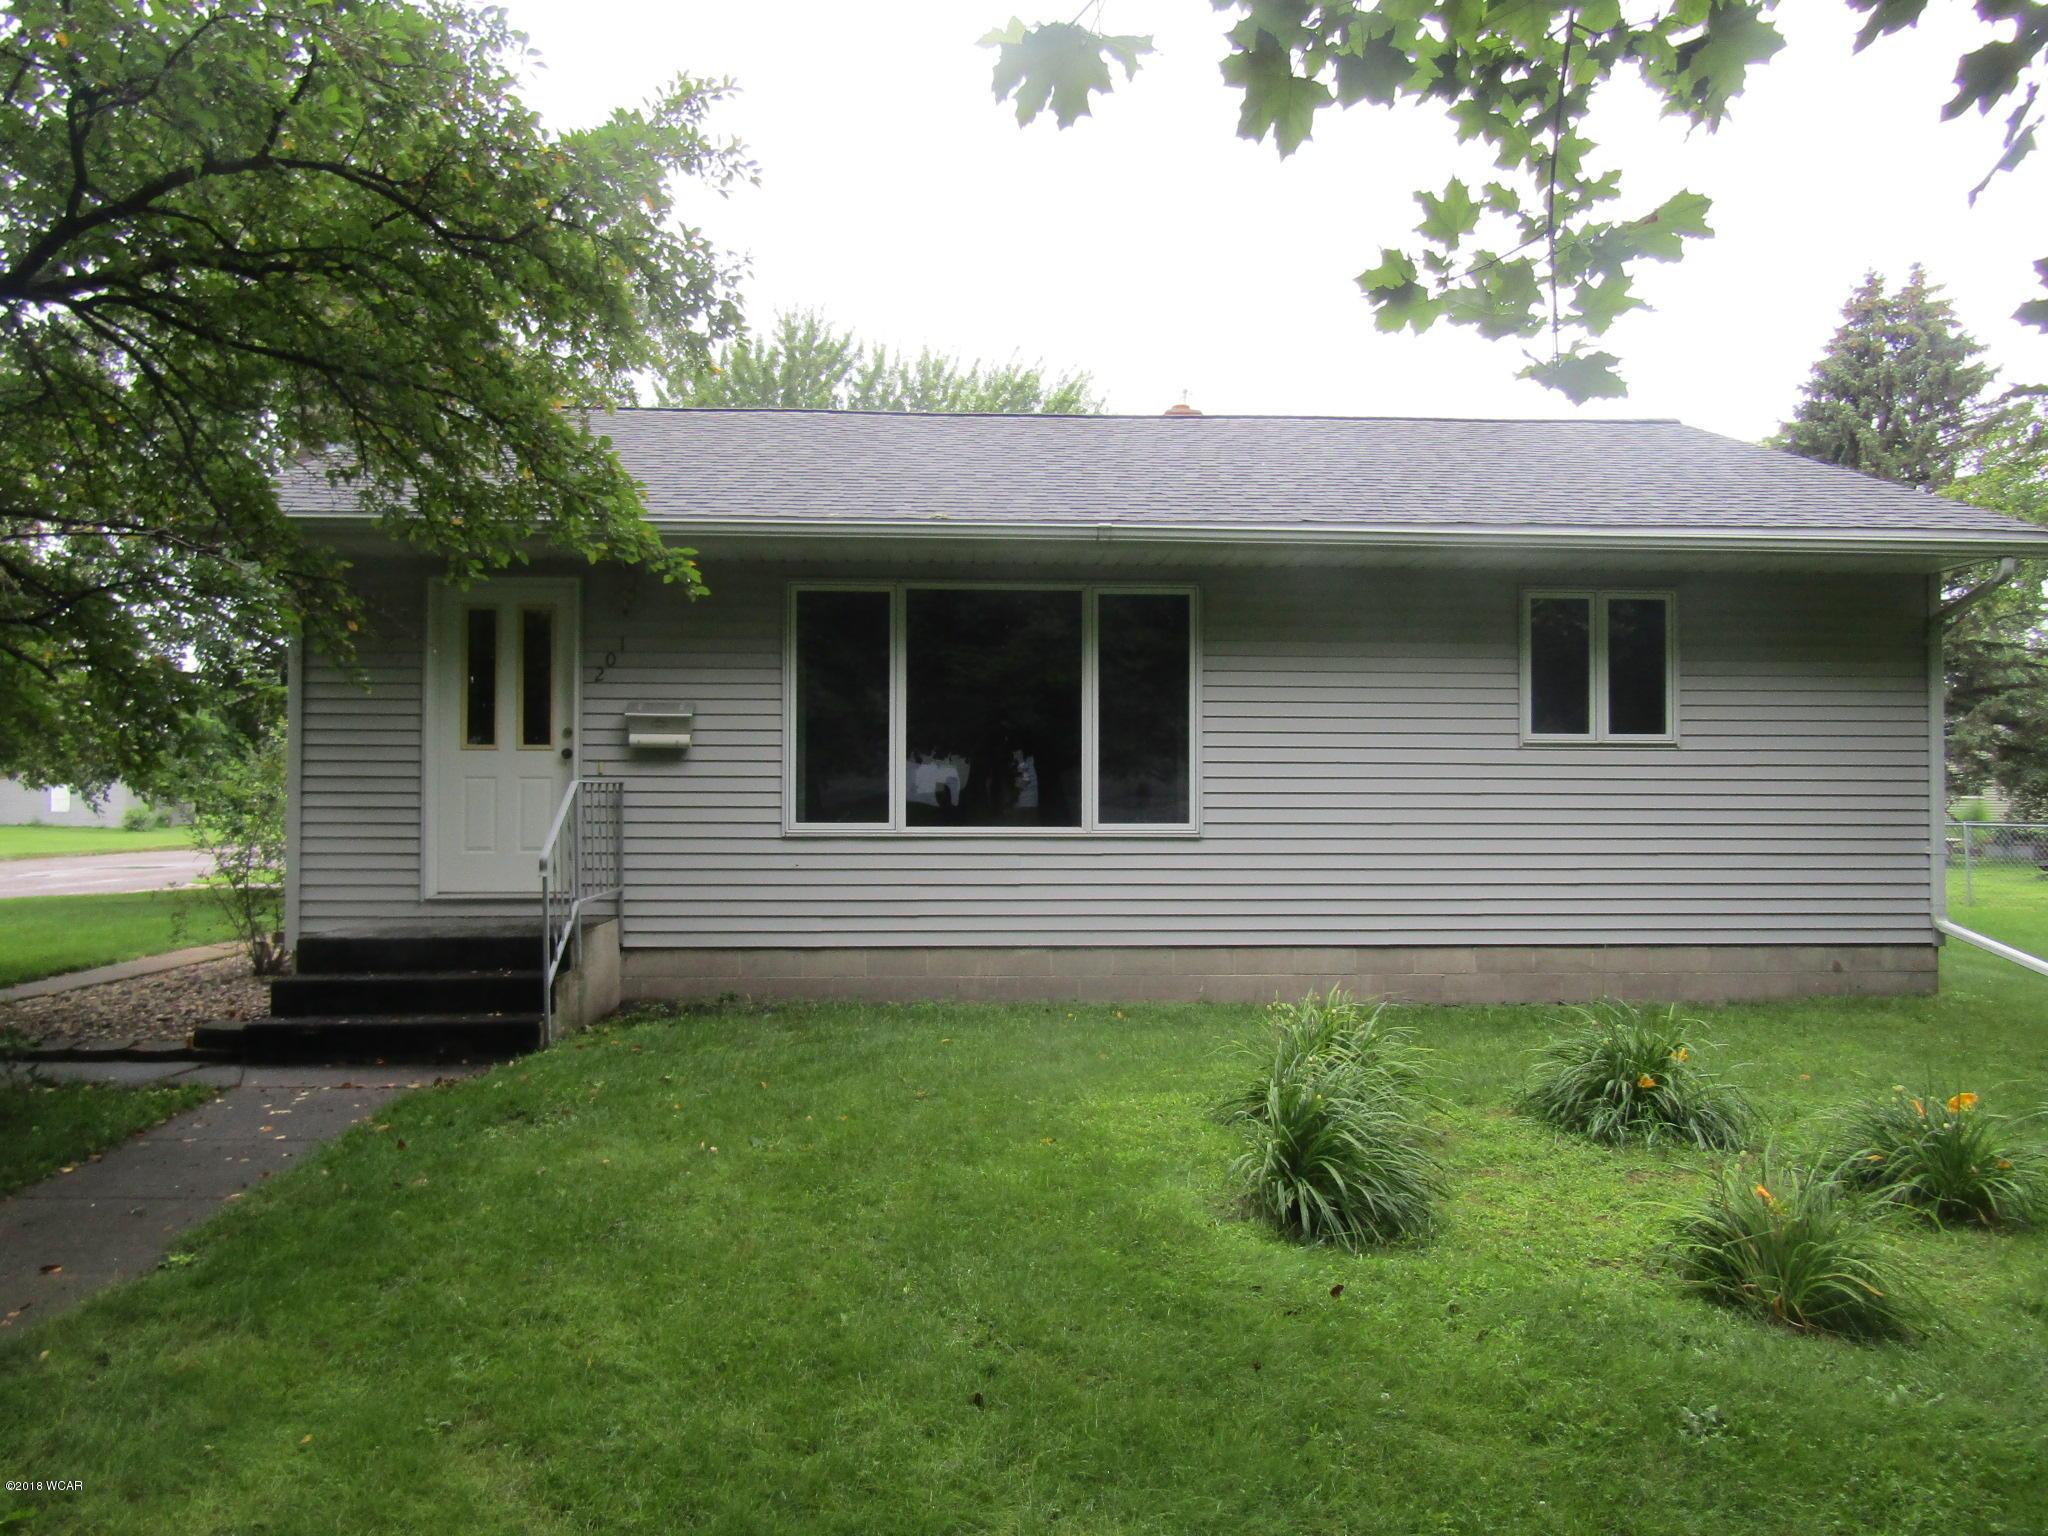 201 Sanford Road,Benson,2 Bedrooms Bedrooms,2 BathroomsBathrooms,Single Family,Sanford Road,6031788